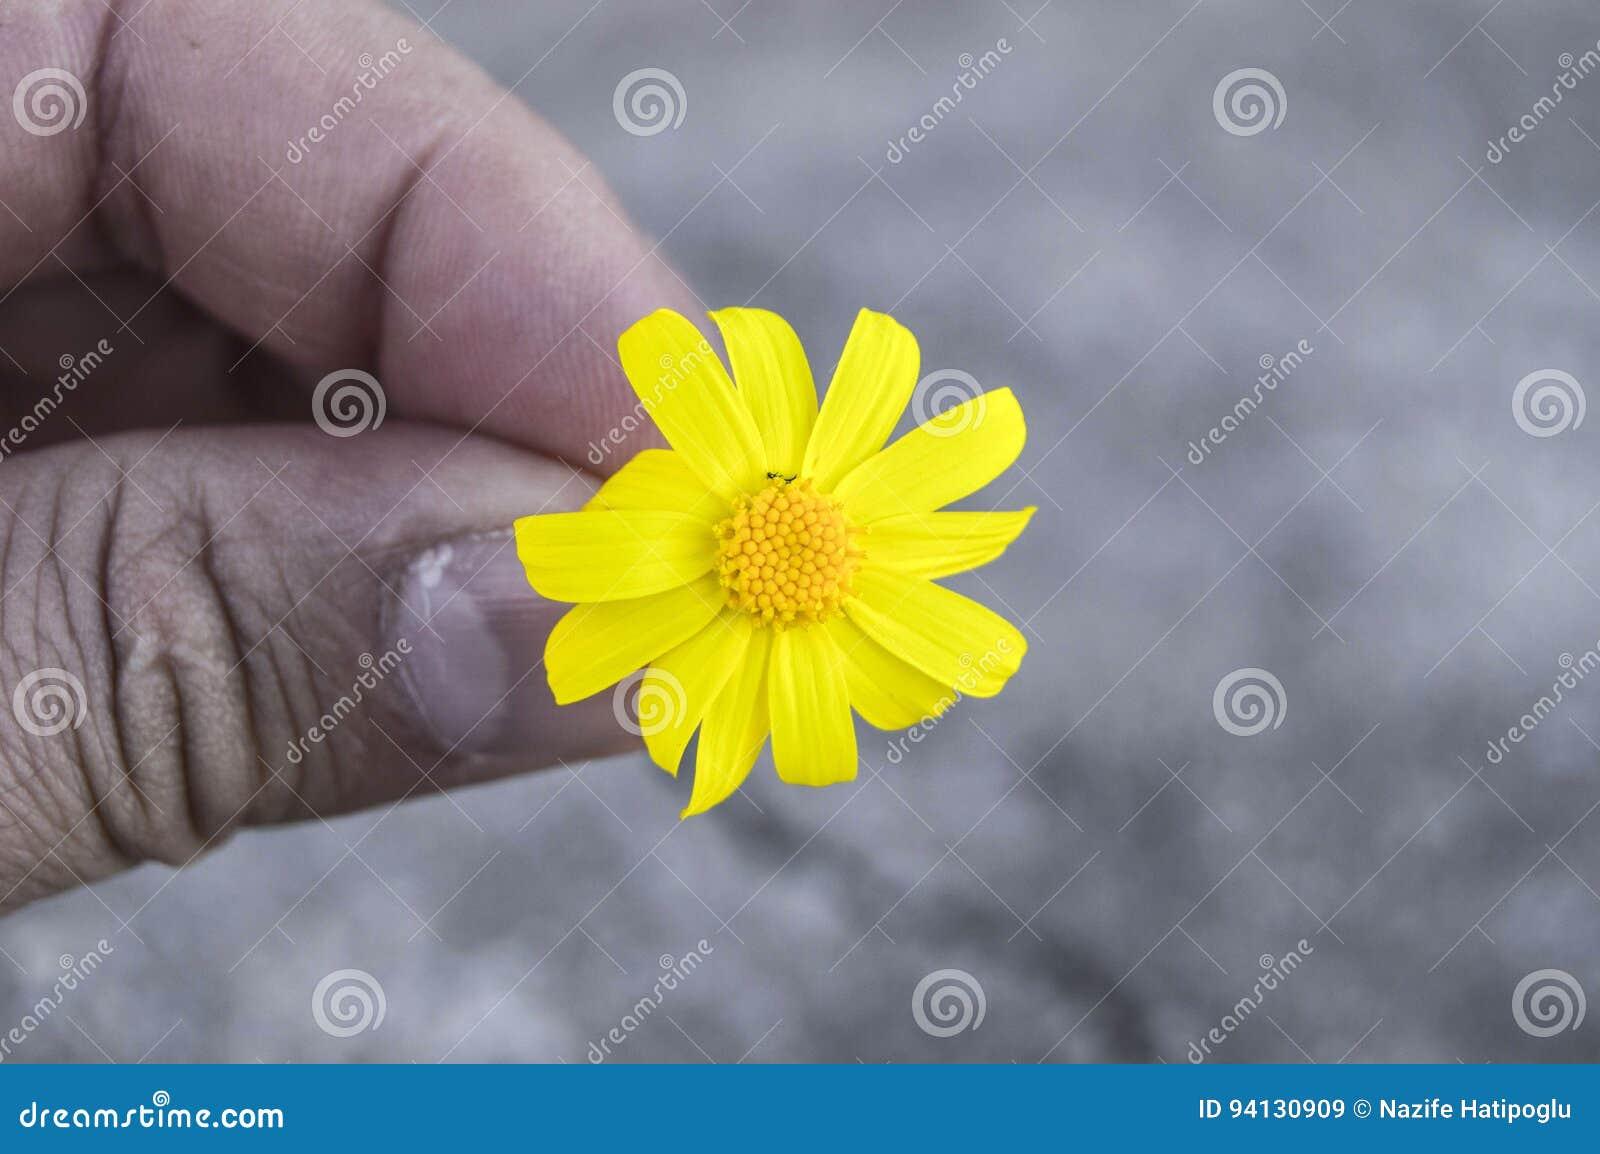 Yellow Daisy Flowerssidewalks Ornamental Flowers Natural Colored